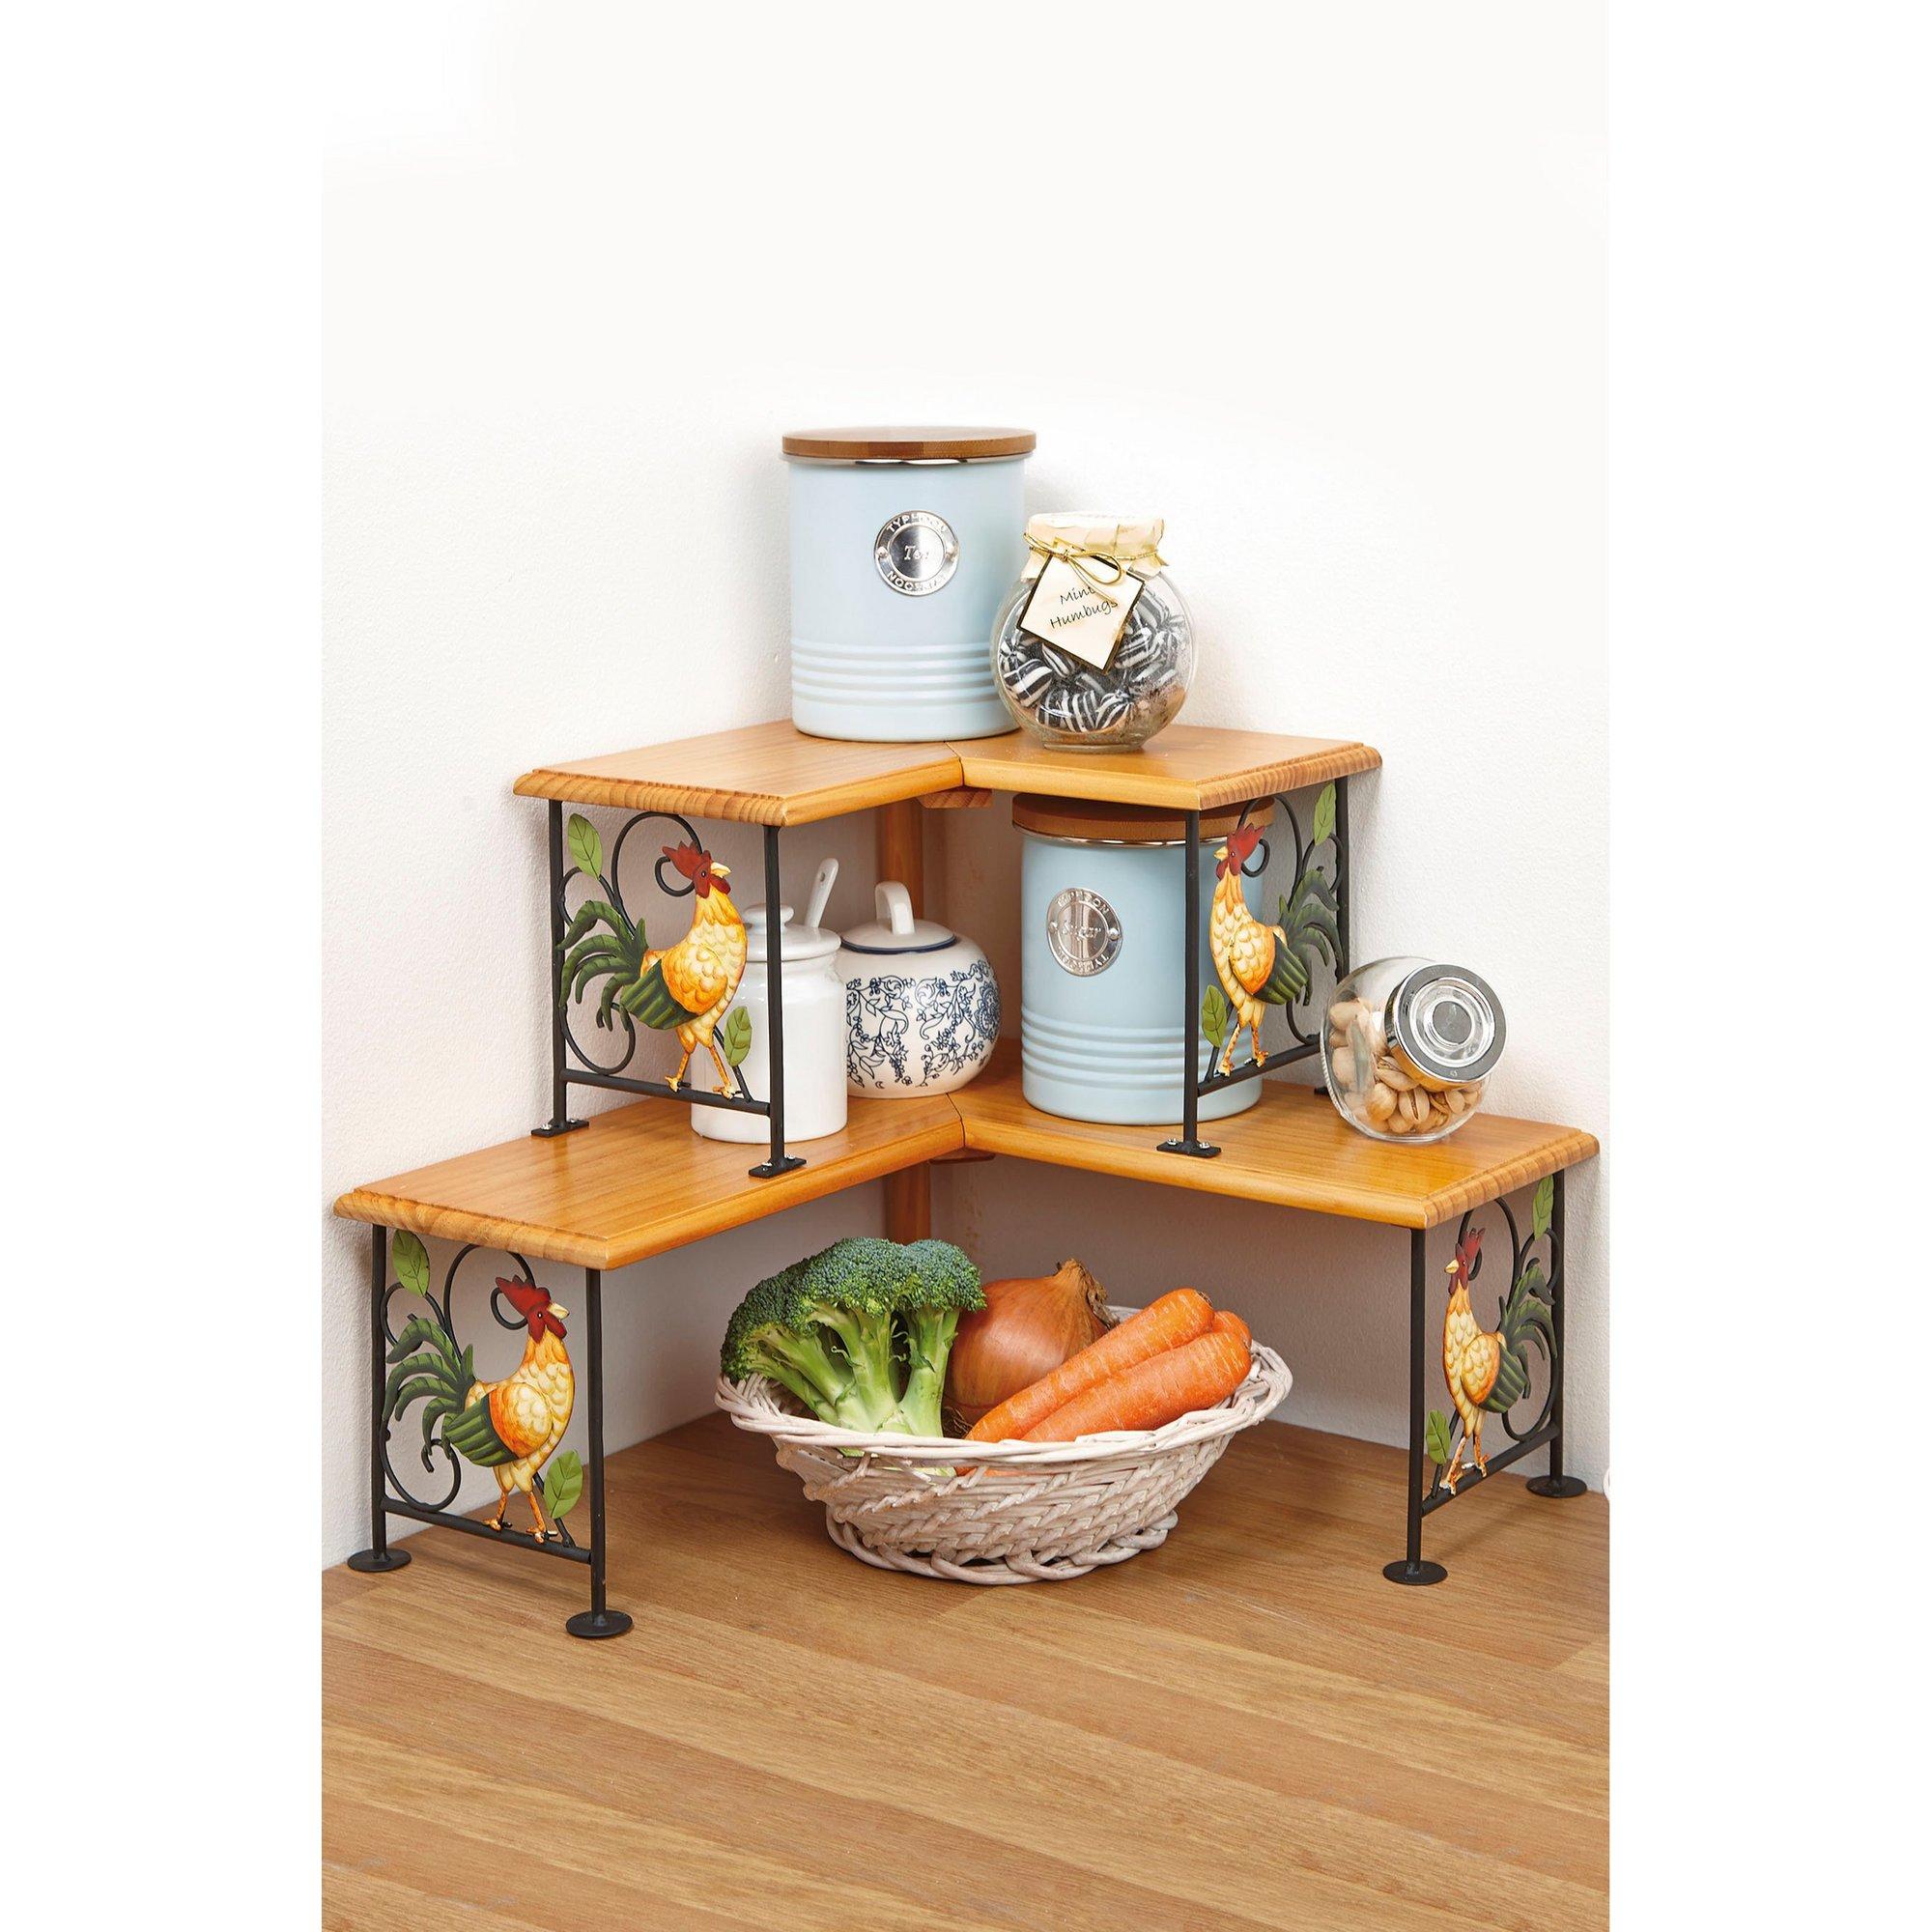 Image of Cockerel Corner Shelf